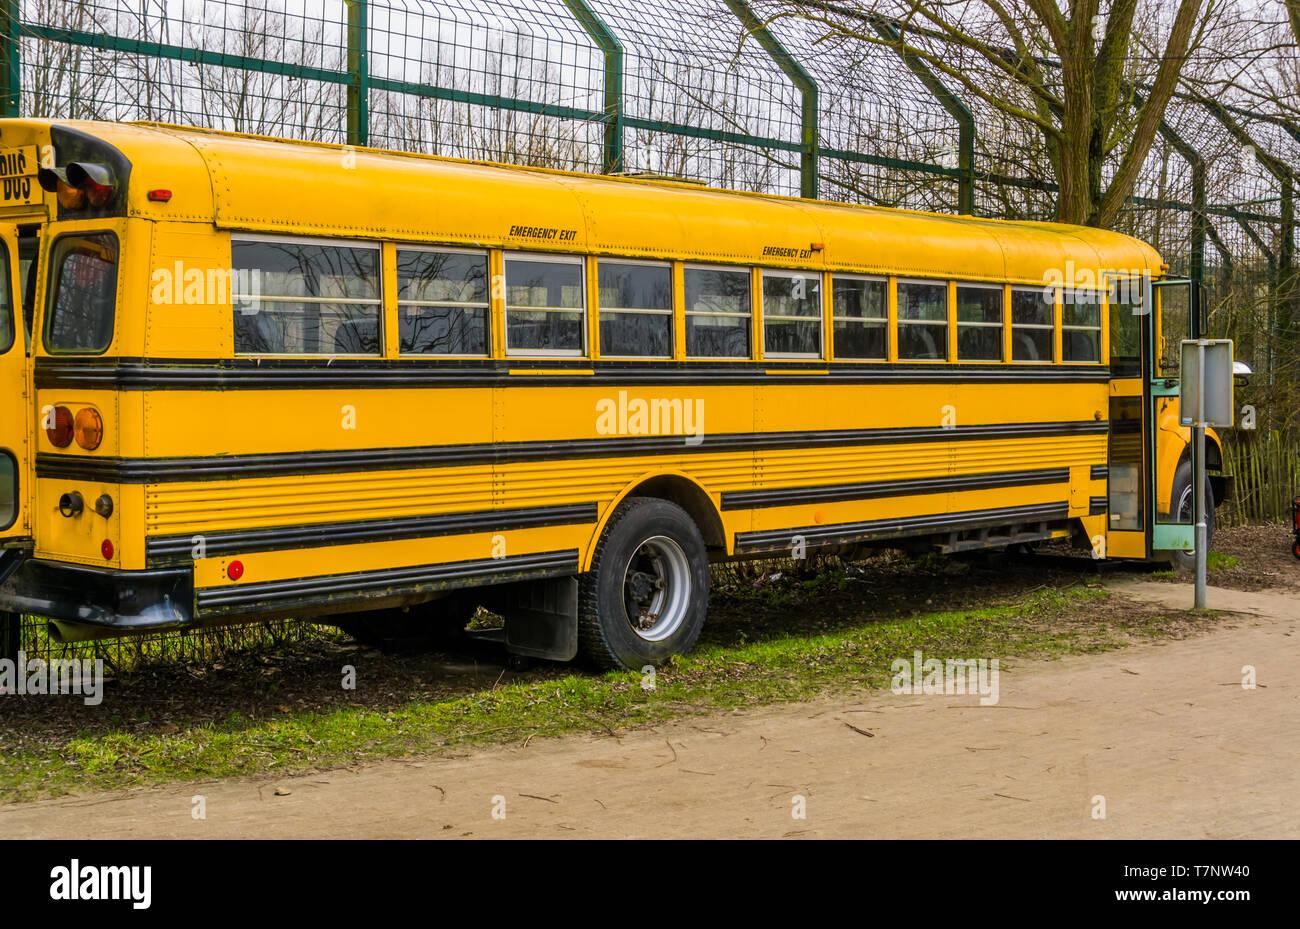 yellow old vintage school bus, Retro vehicles